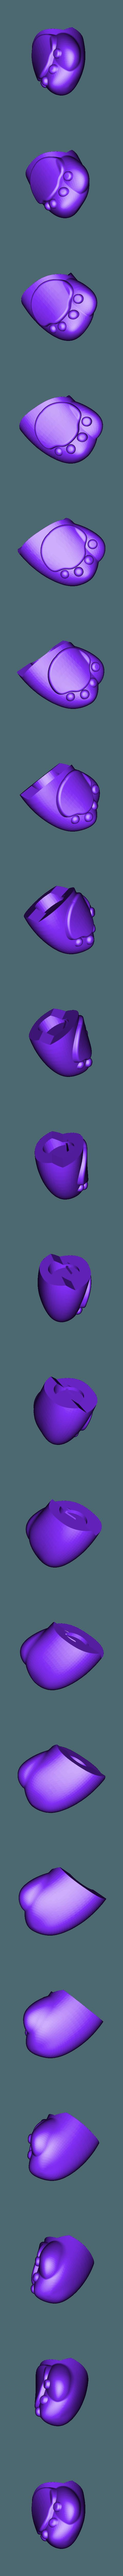 86Duino_bear_Deadpool_type_-_09.STL Download free STL file 86Duino Bear Deadpool • 3D printer template, 86Duino